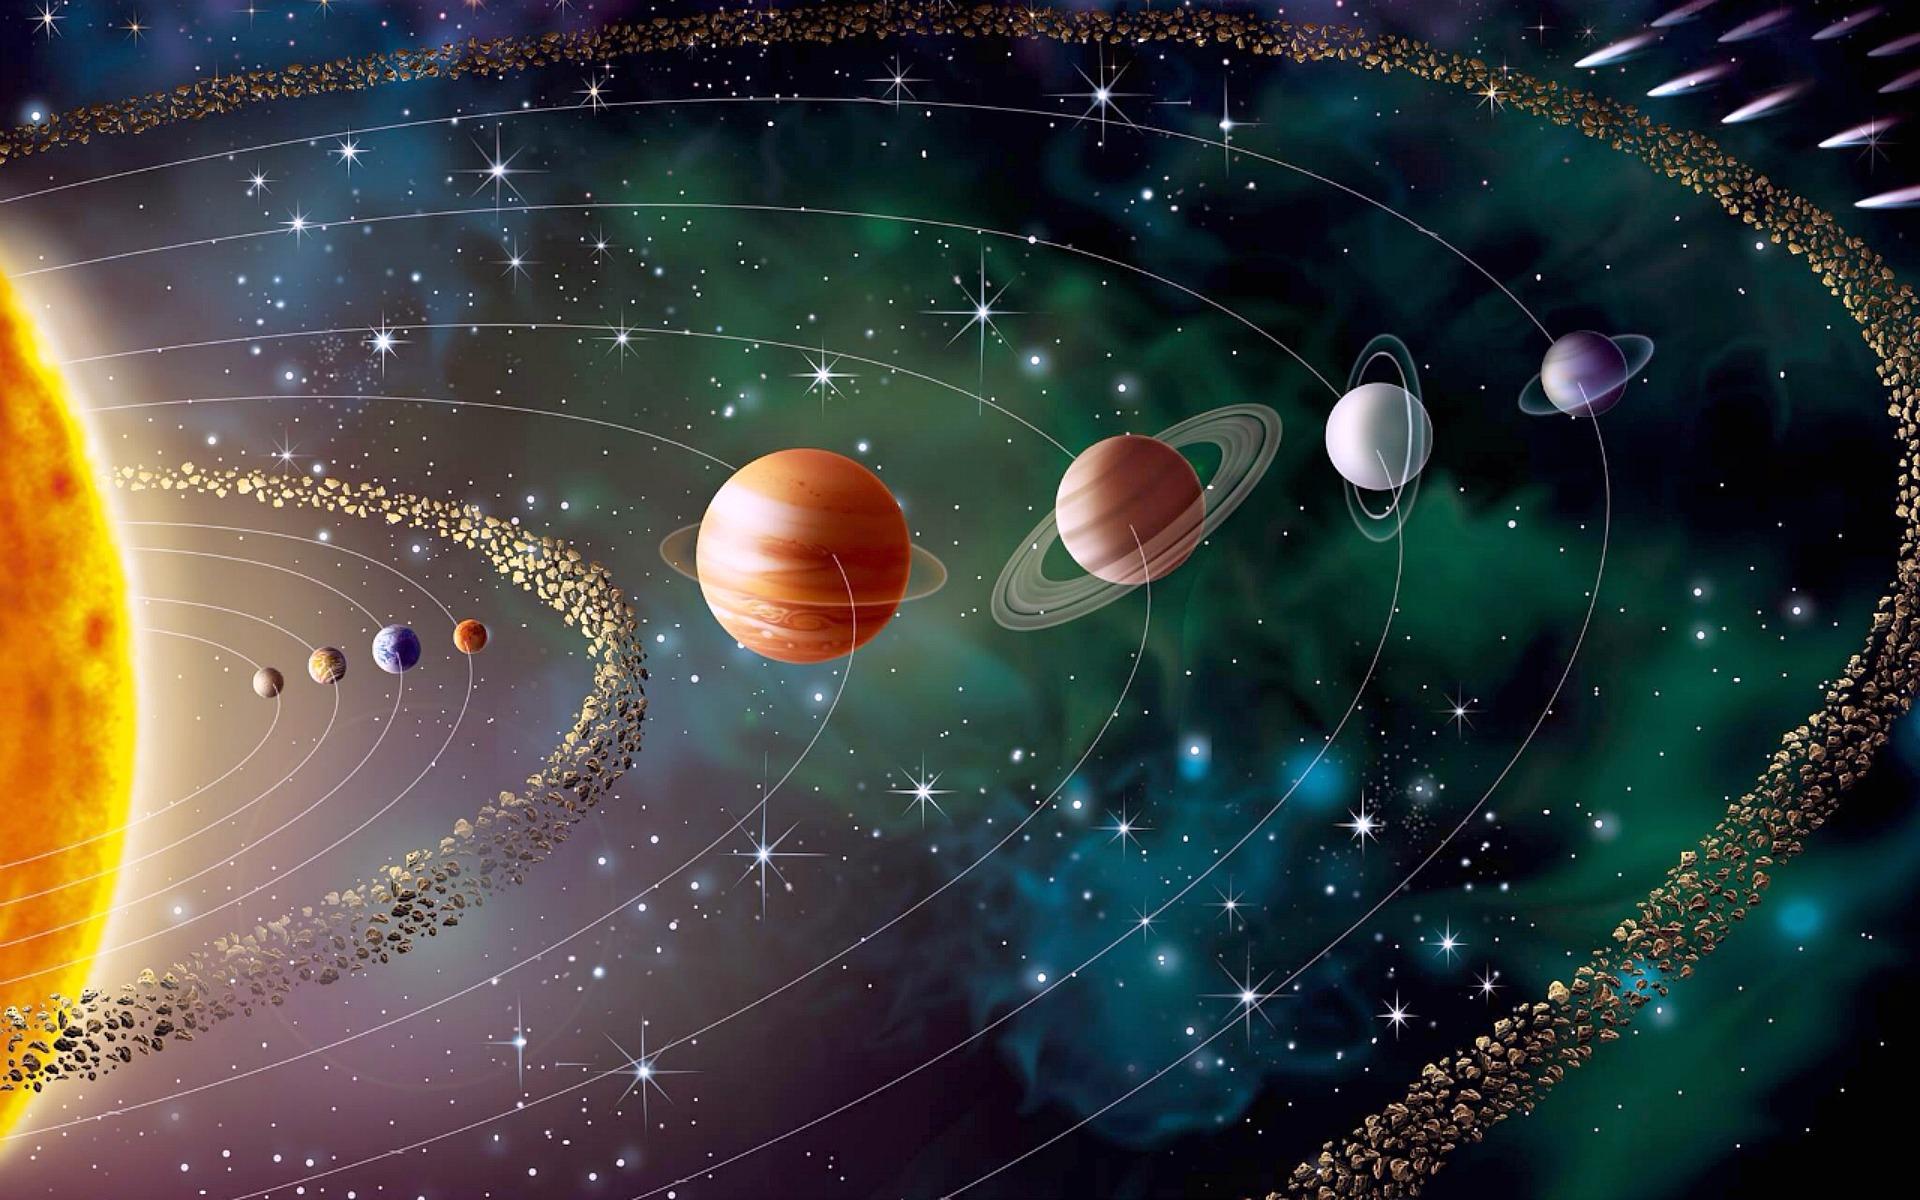 Solar System Desktop Background HD 1920x1200